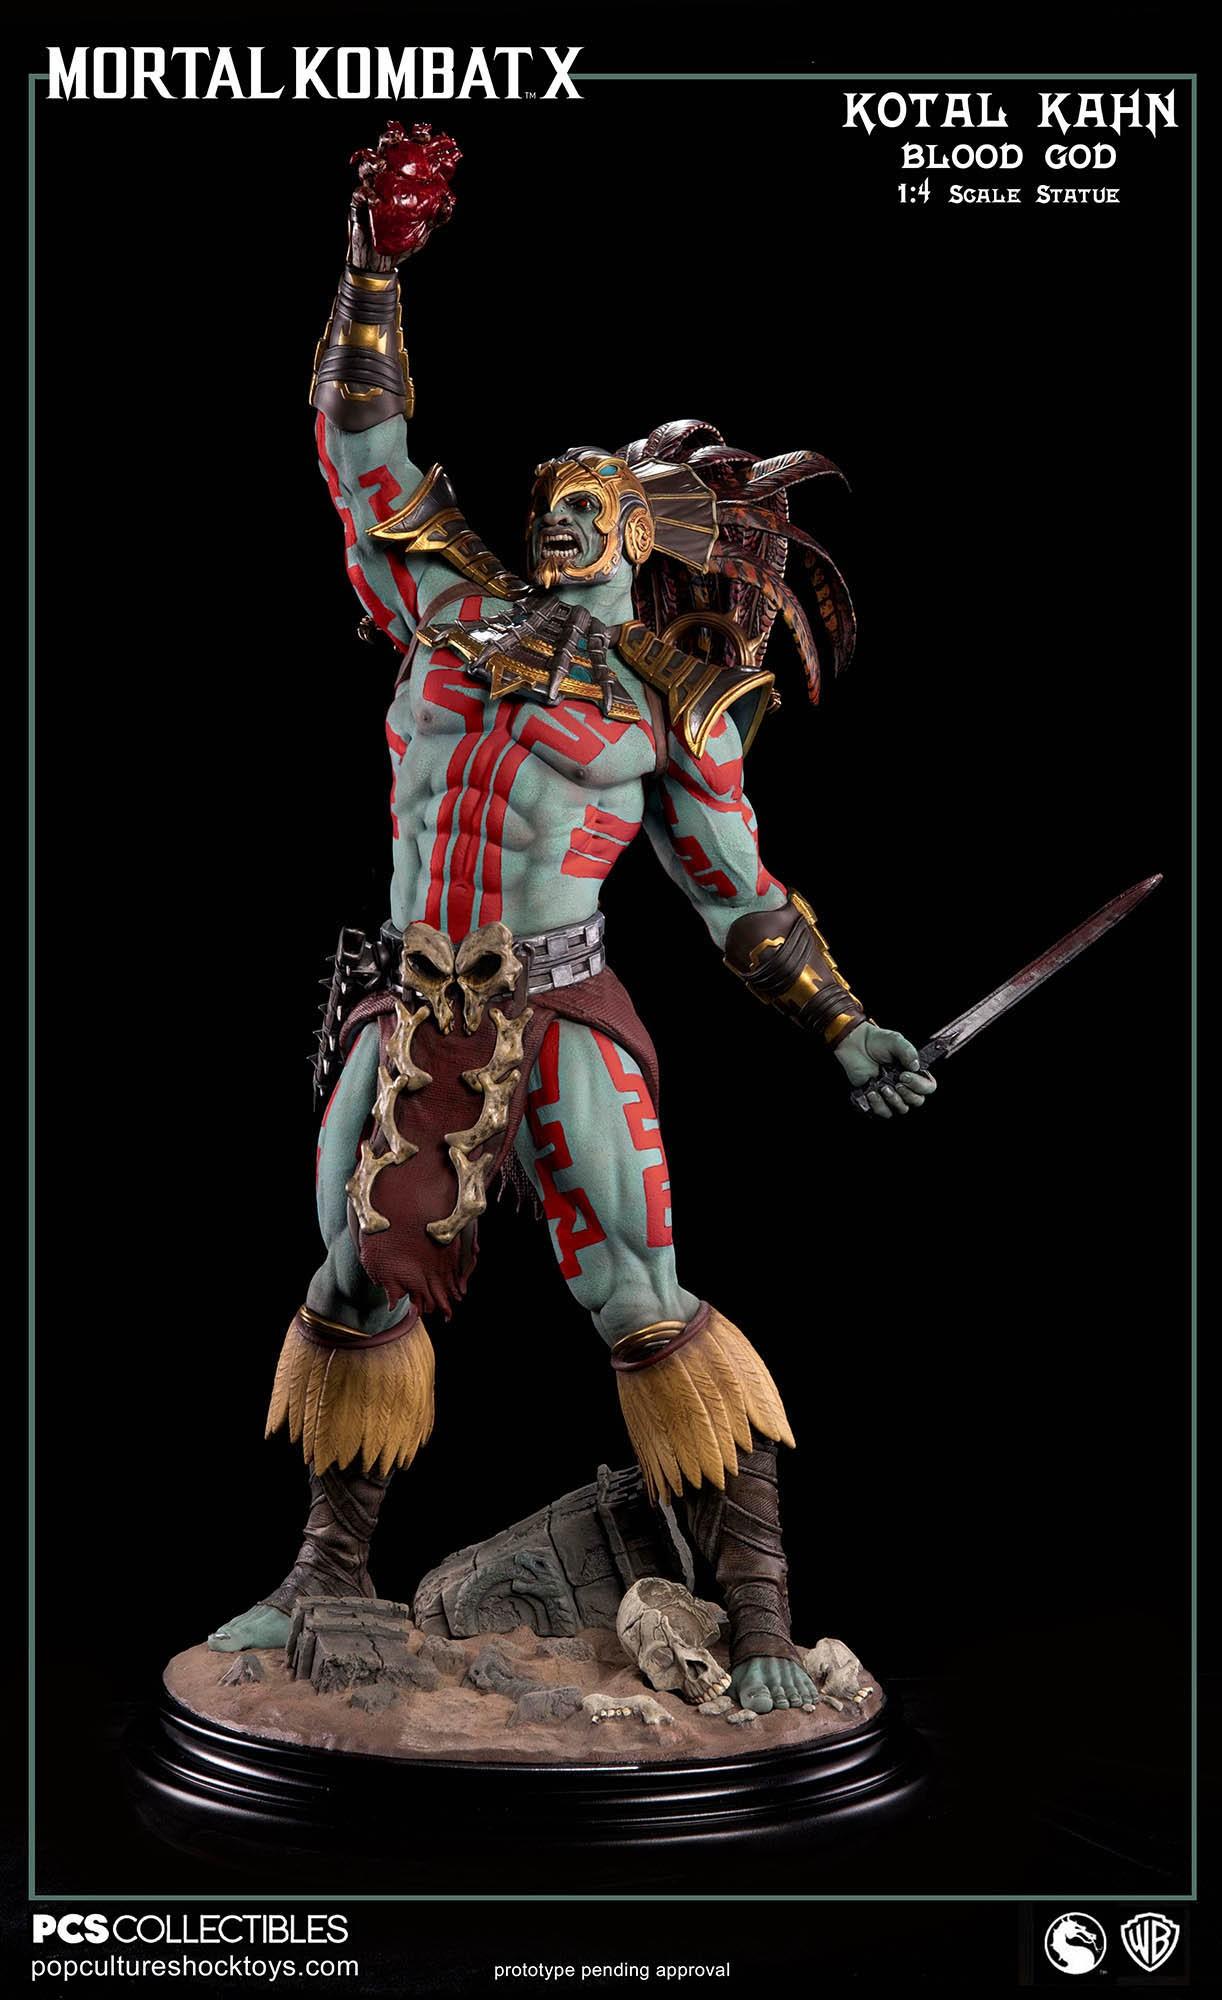 [Pop Culture Shock] Mortal Kombat X: Kotal Kahn 1:4 scale PCS-Kotal-Kahn-Blood-God-025